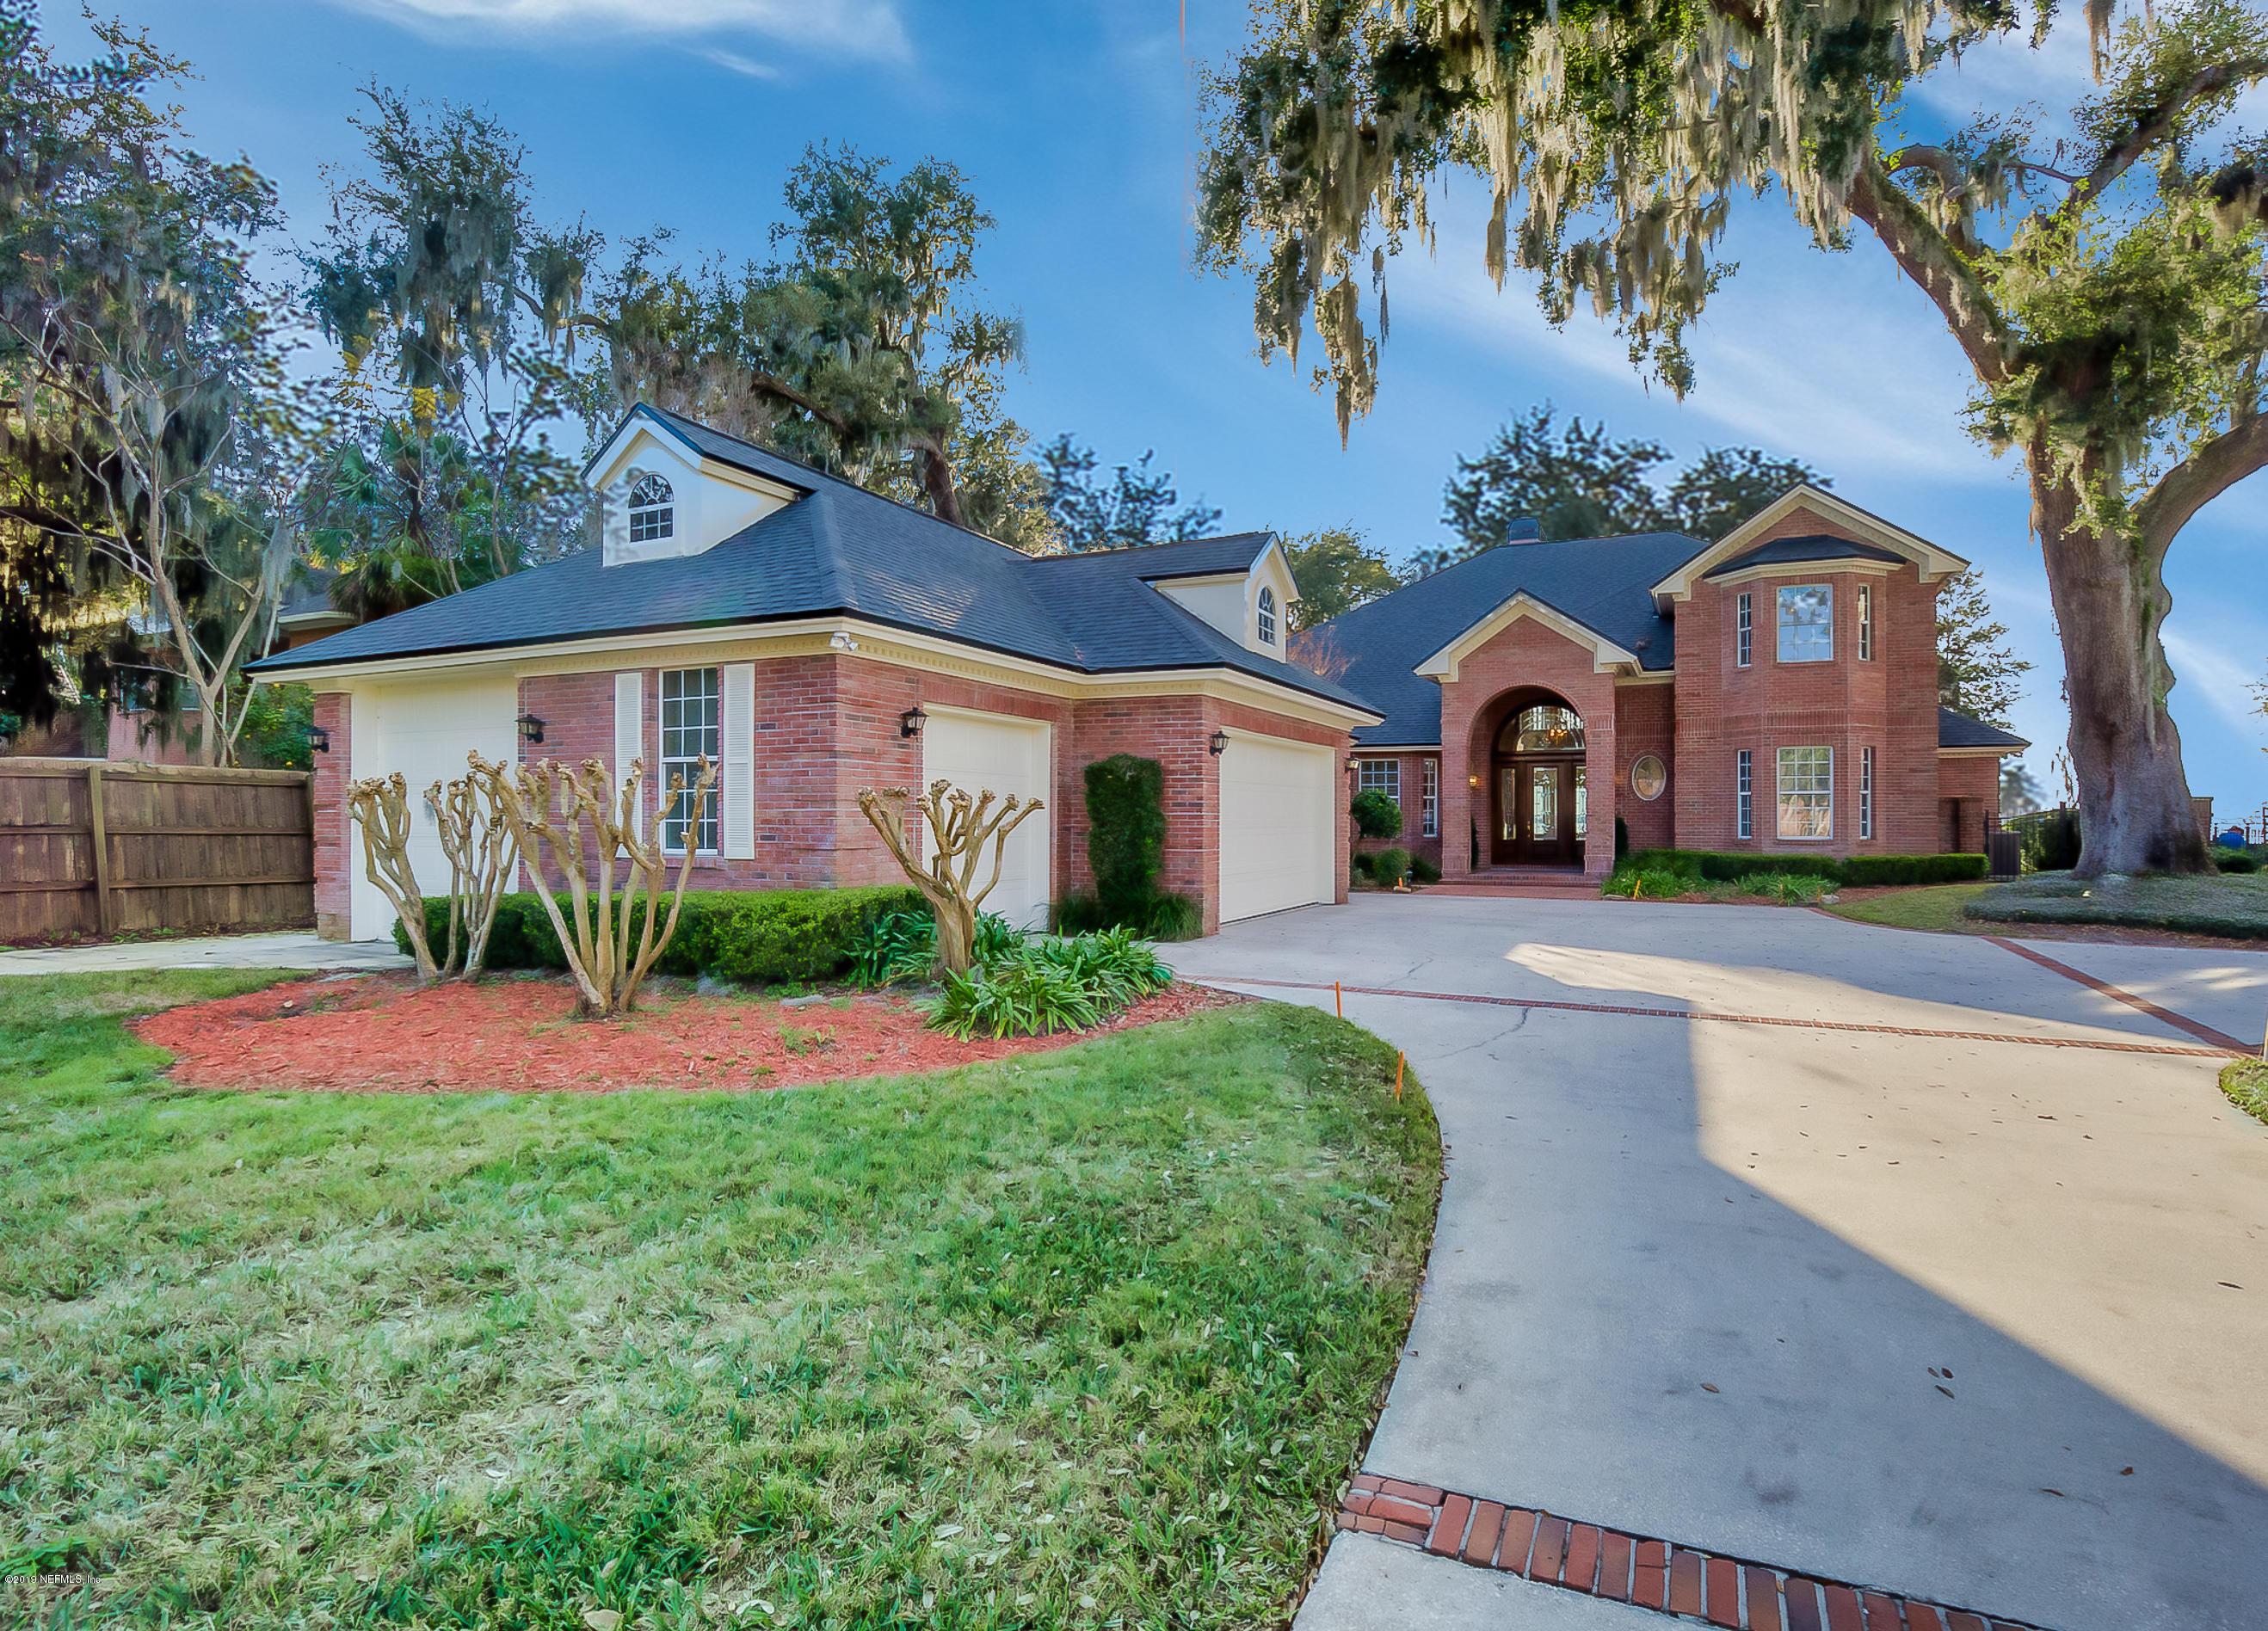 1365 CADDELL, JACKSONVILLE, FLORIDA 32217, 4 Bedrooms Bedrooms, ,4 BathroomsBathrooms,Residential - single family,For sale,CADDELL,979128